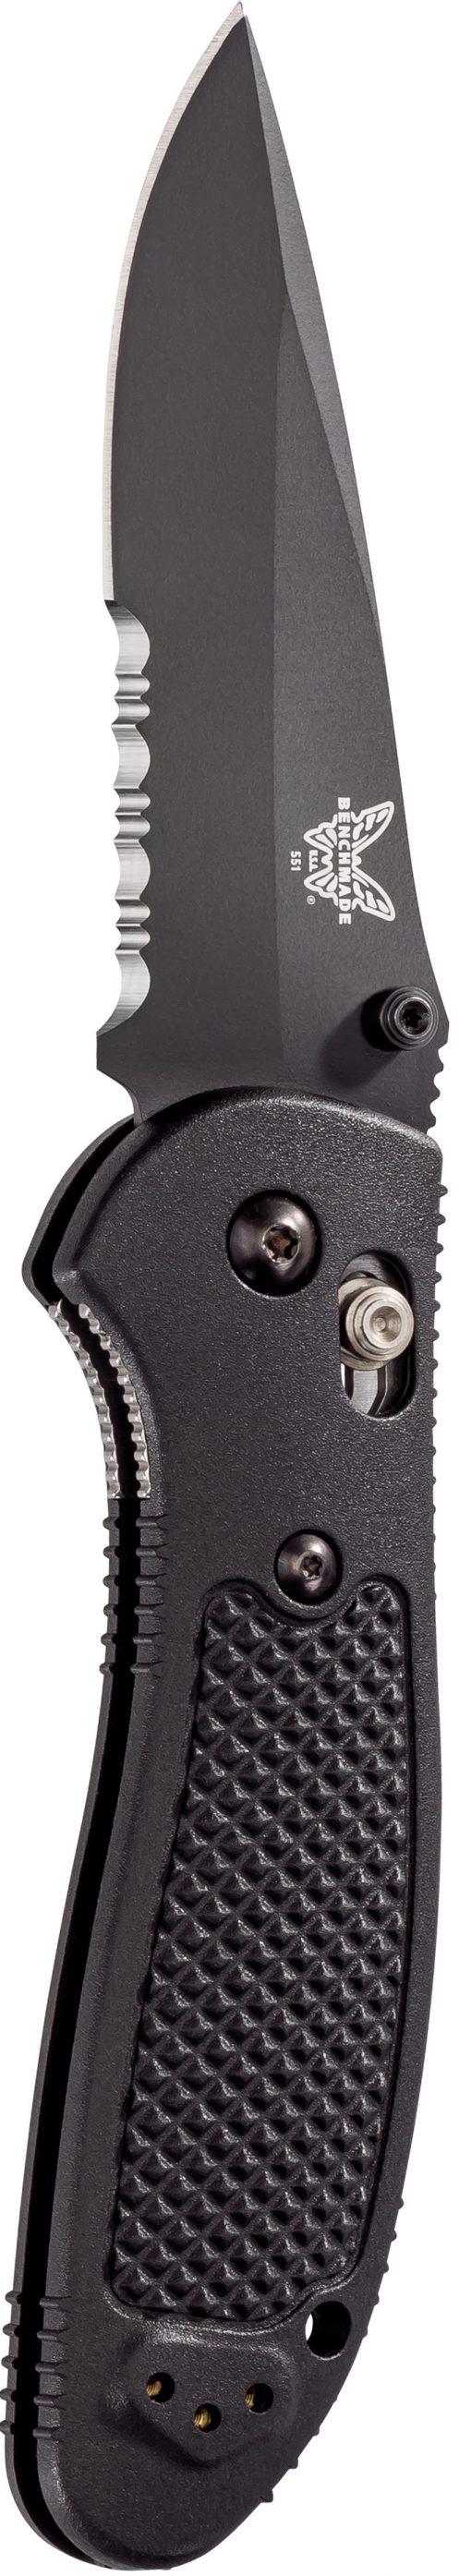 Benchmade Griptilian Black S30V Drop Point Combo Blade Black Nylon Handle Front Side Open Up